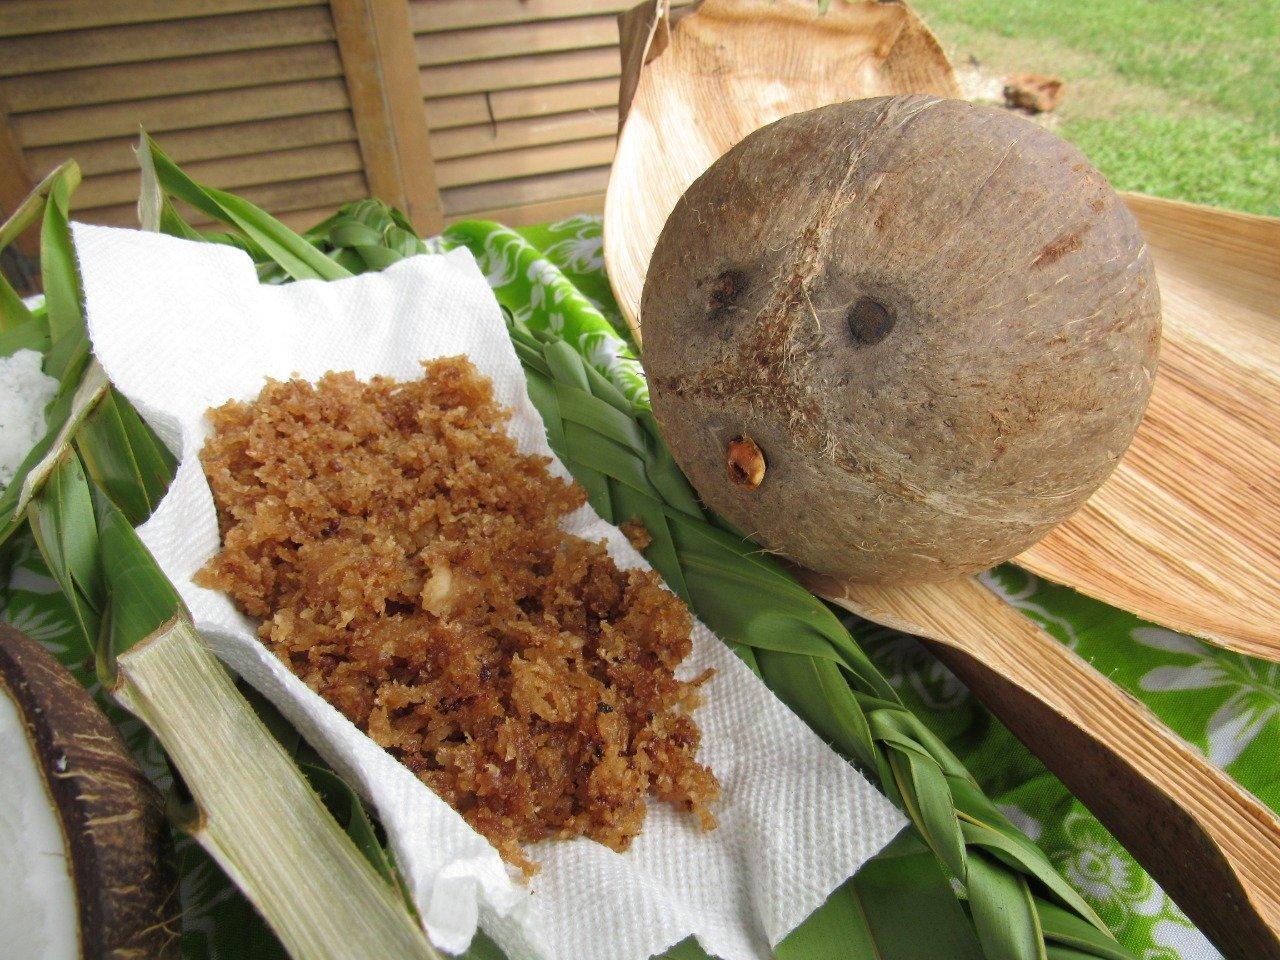 Kids Guam Summer Camp Coconut Candy Making